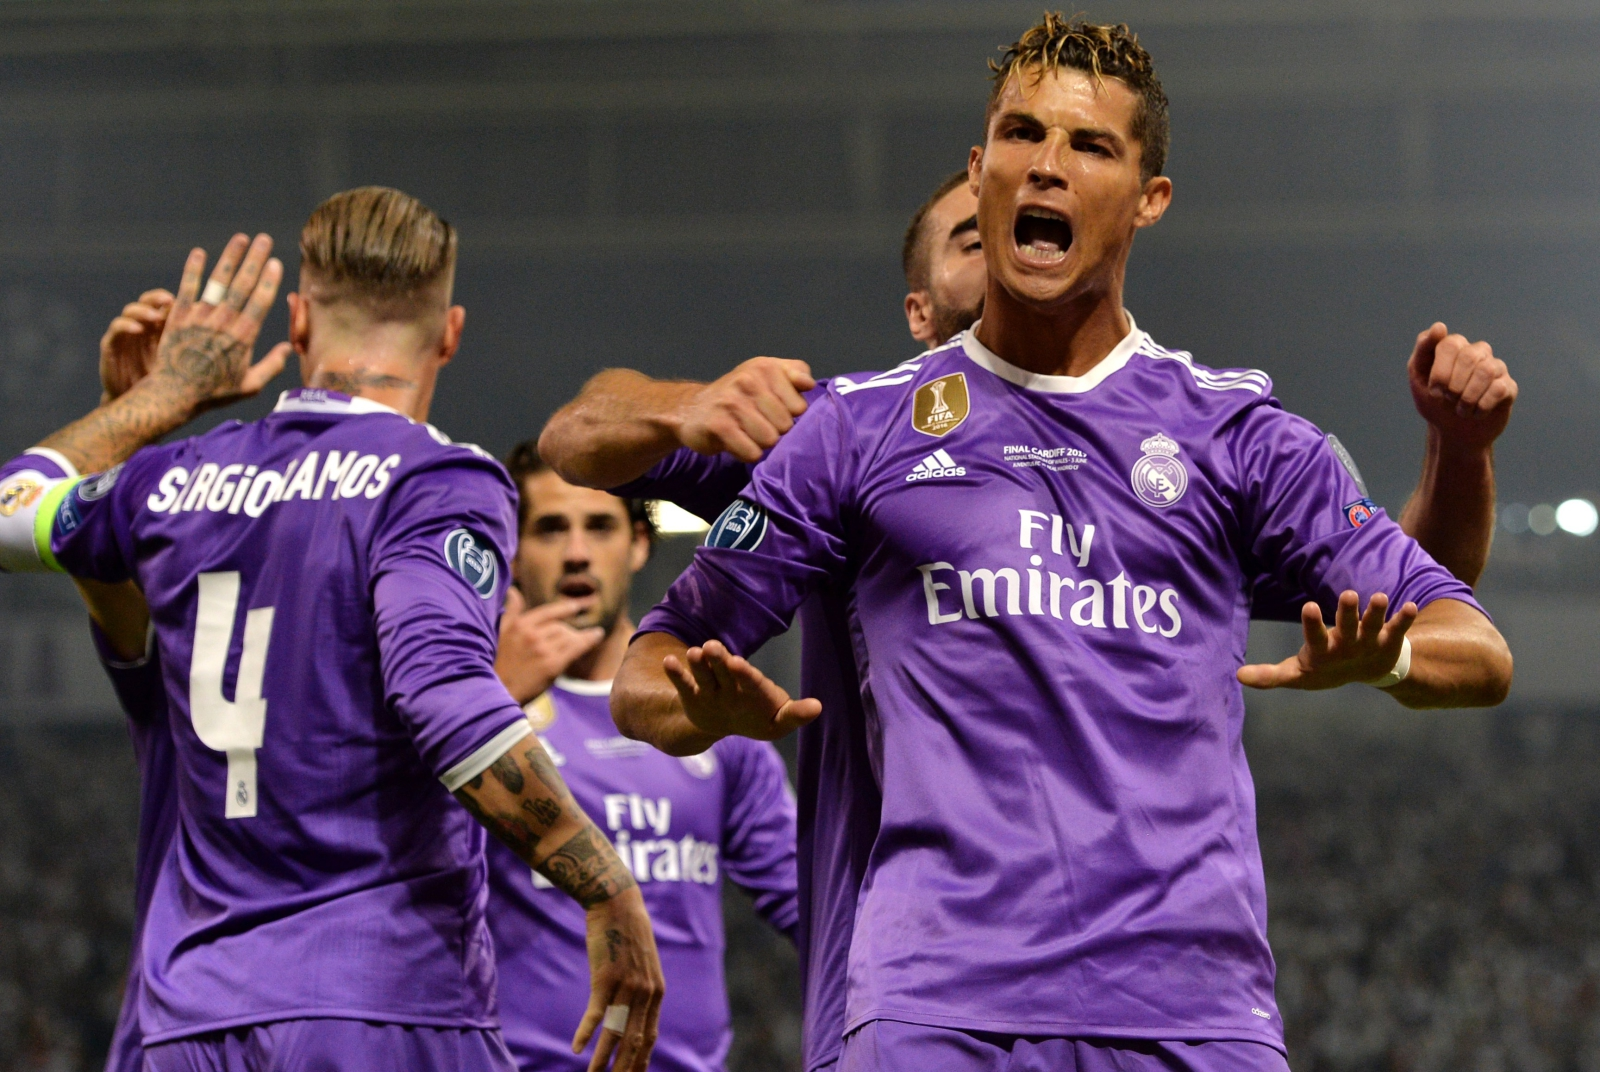 Christiano Ronaldo seks gejowski miley cyrus ciasne cipki